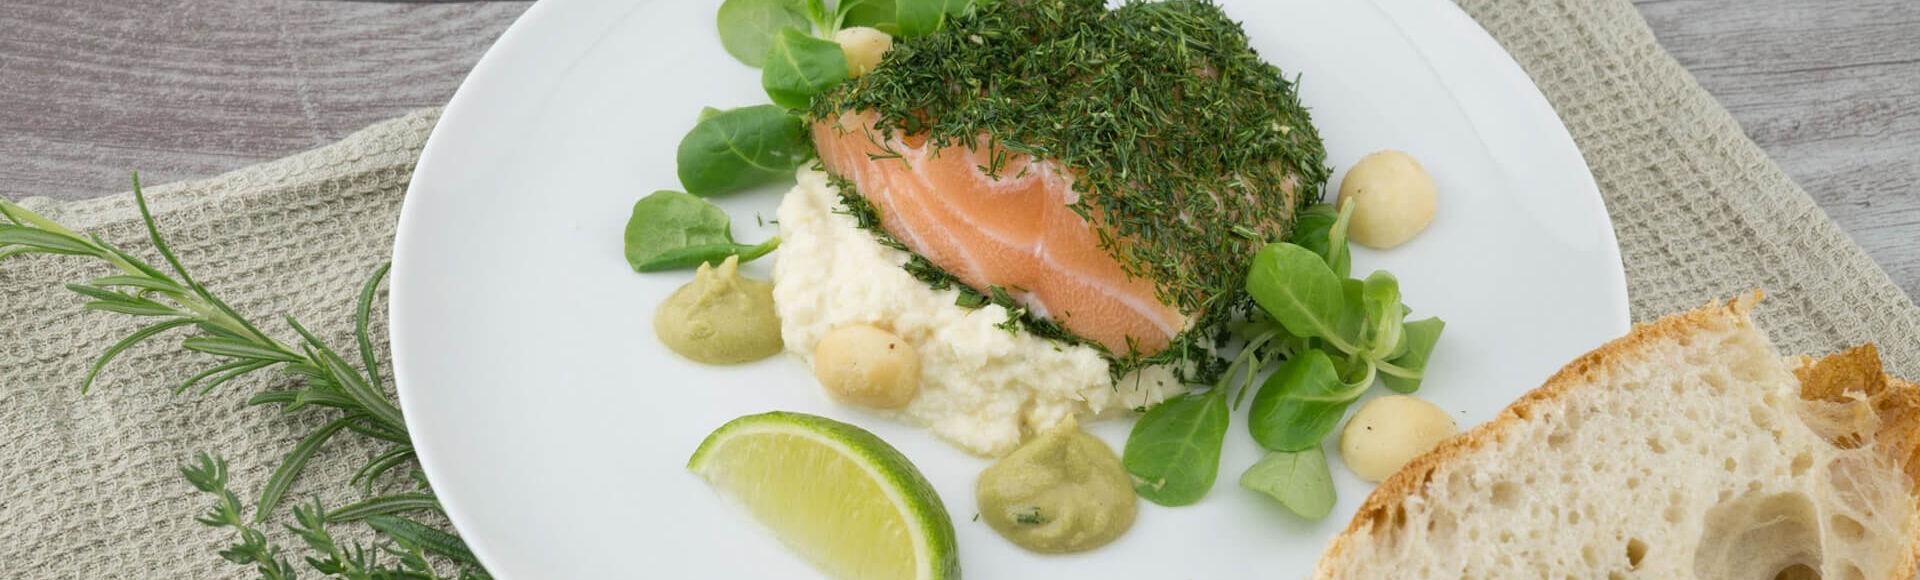 Dieta proteica na gravidez